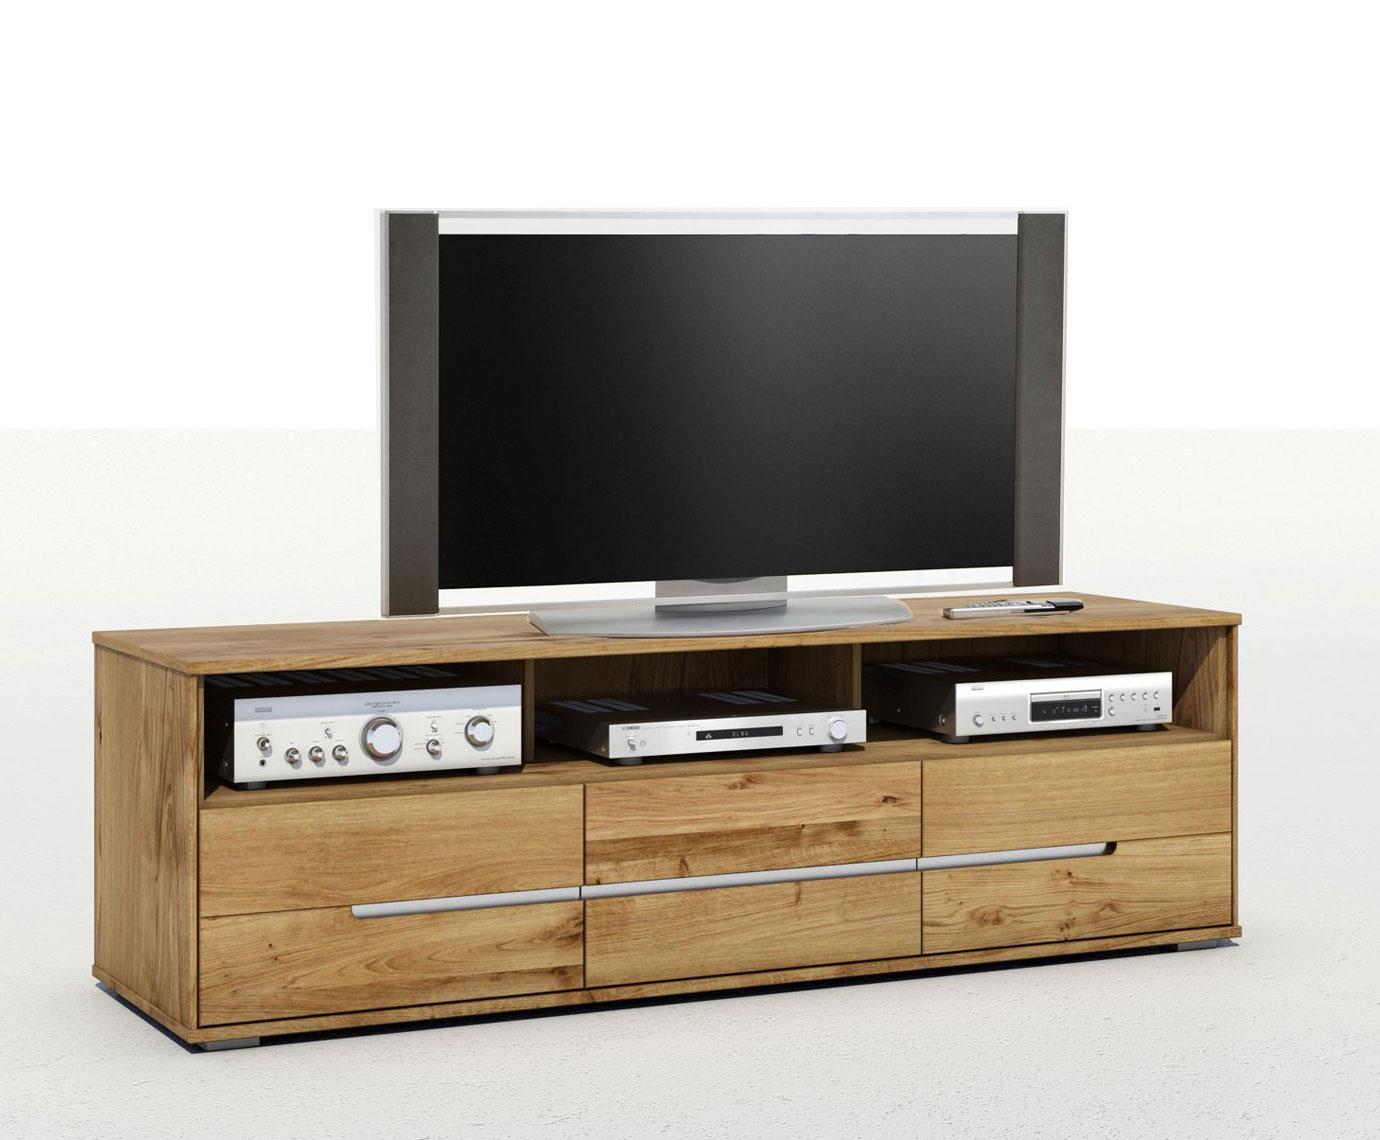 elfo tv schrank lowboard lissy aus massivholz von elfo g nstig bestellen skanm bler. Black Bedroom Furniture Sets. Home Design Ideas